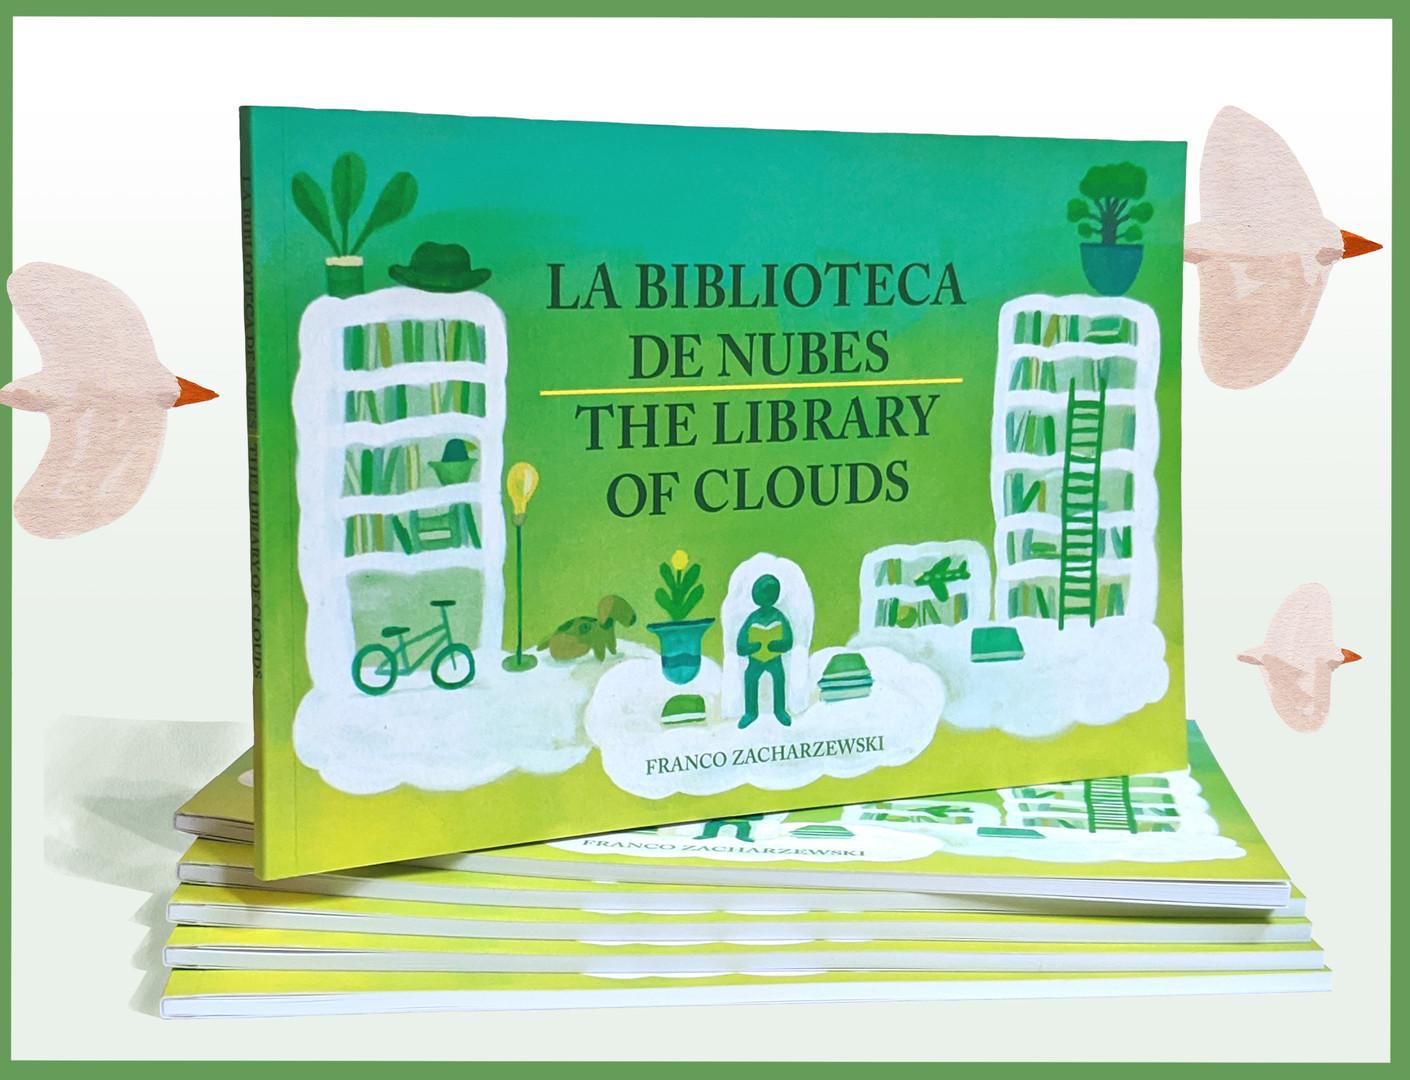 """La biblioteca de nubes | The Library of Clouds"""